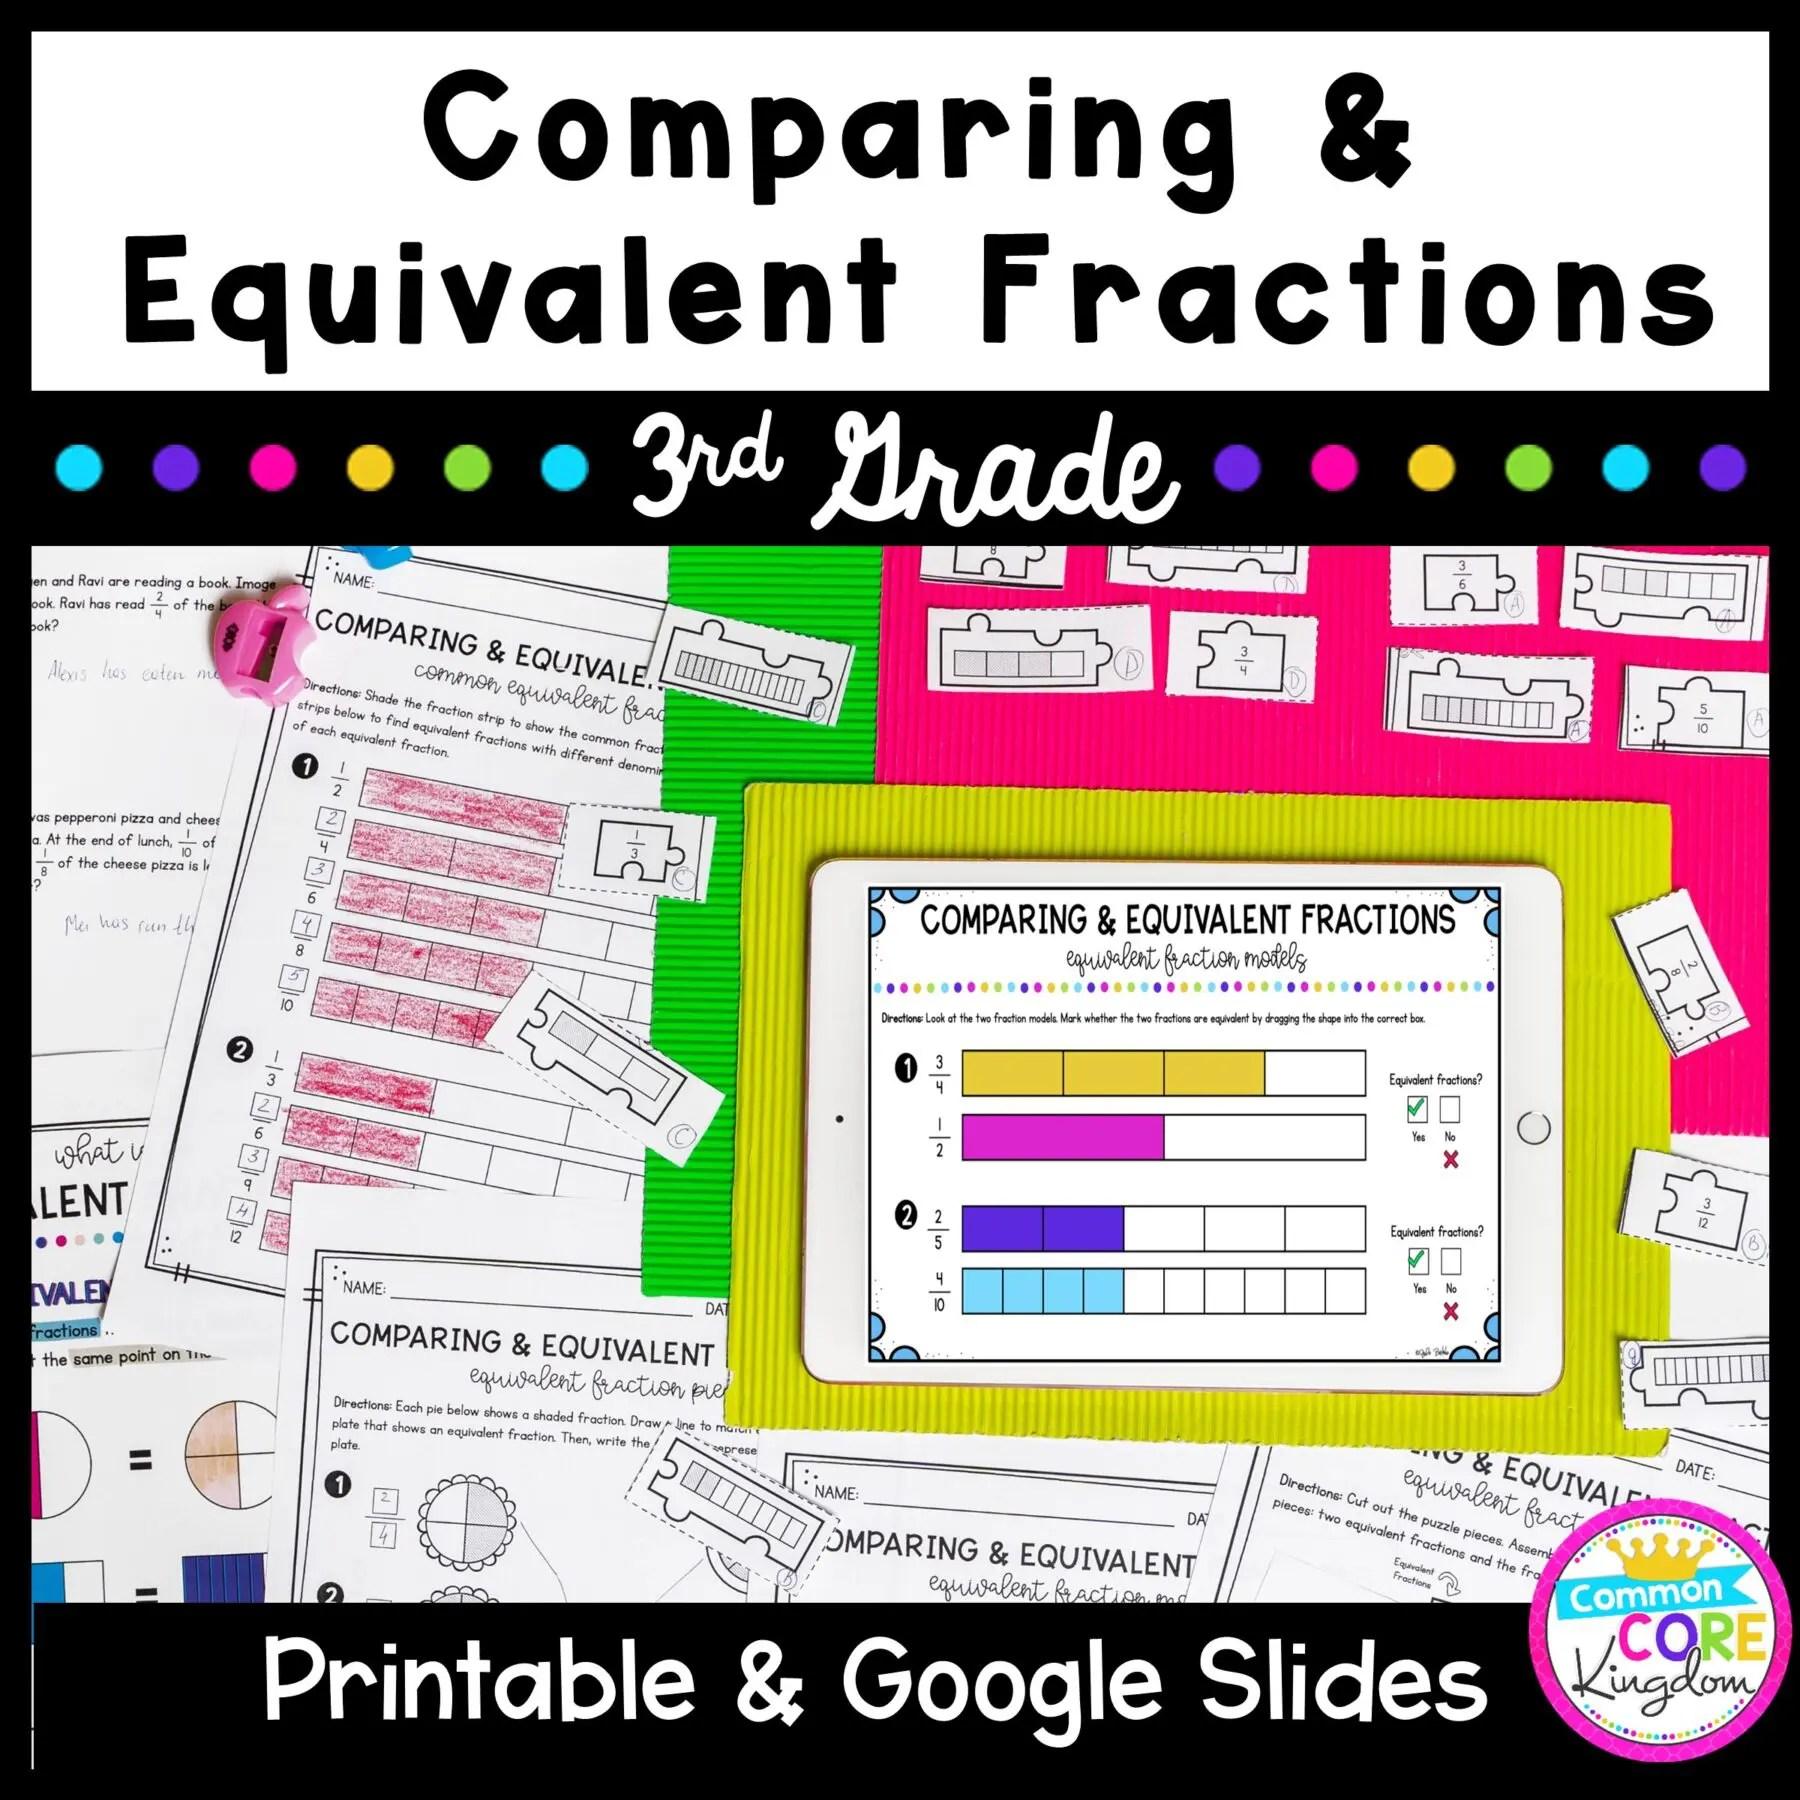 Comparing Equivalent Fractions 3rd Grade Math   Common Core Kingdom [ 1800 x 1800 Pixel ]